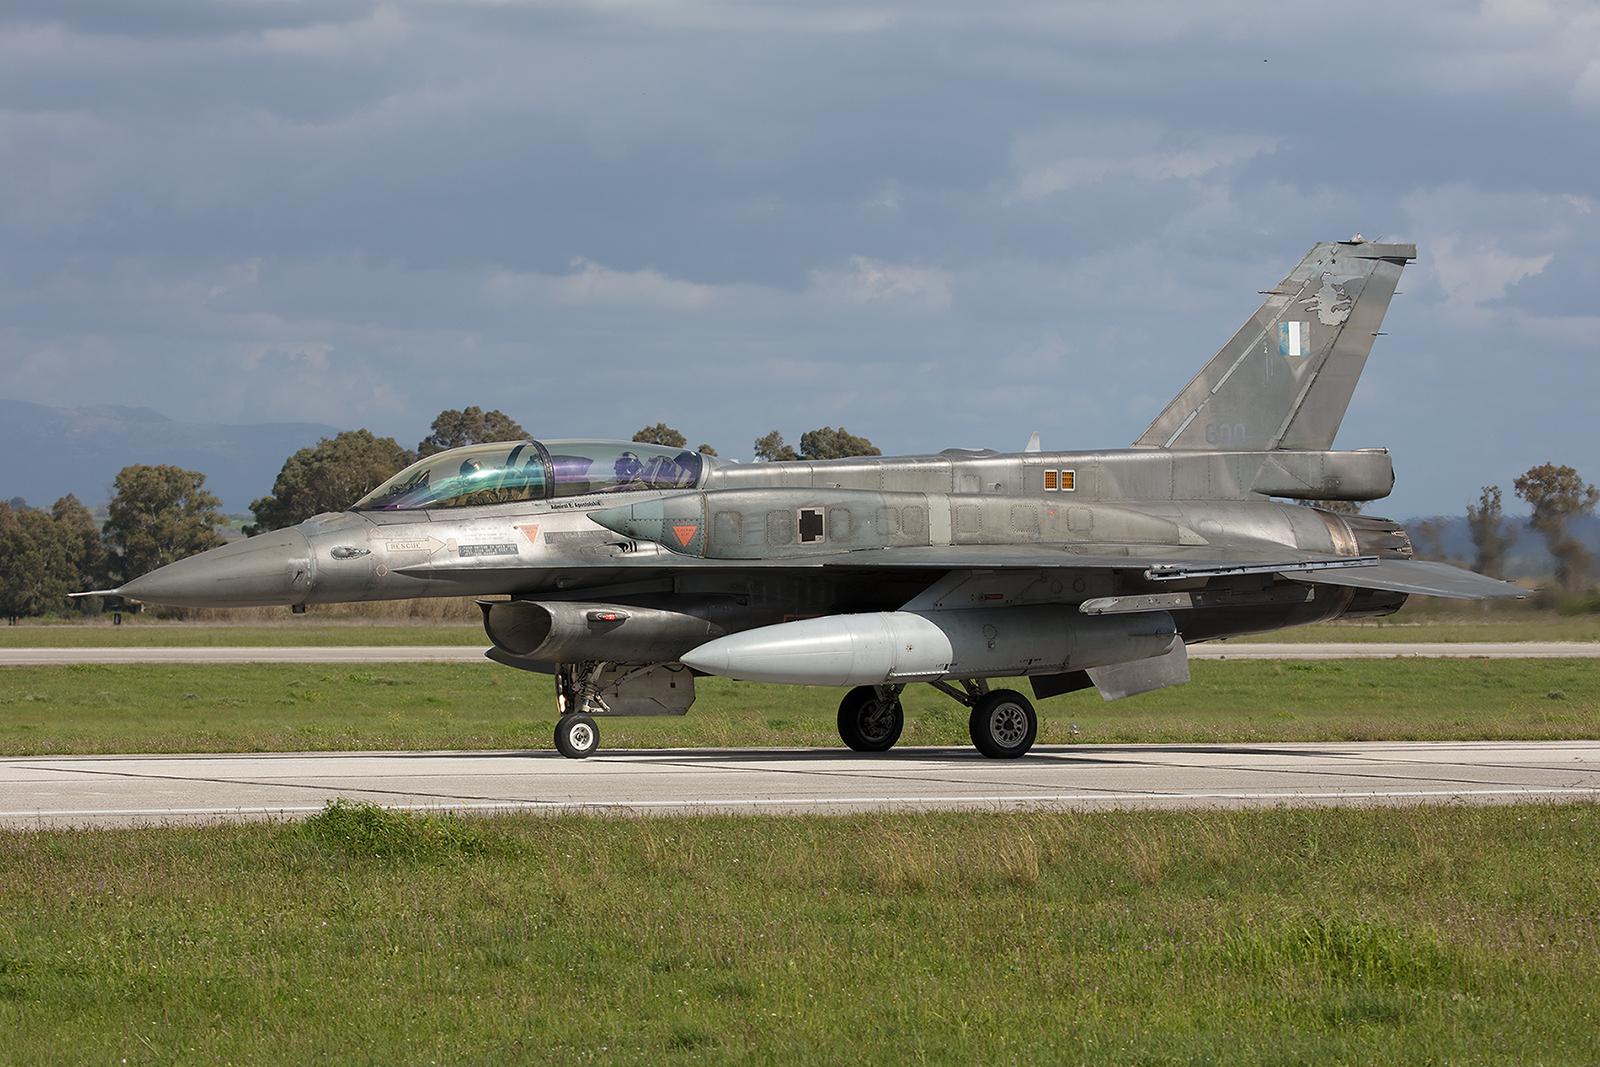 600, General Dynamics F-16D Block 52 der 337 Mira aus Larisa.